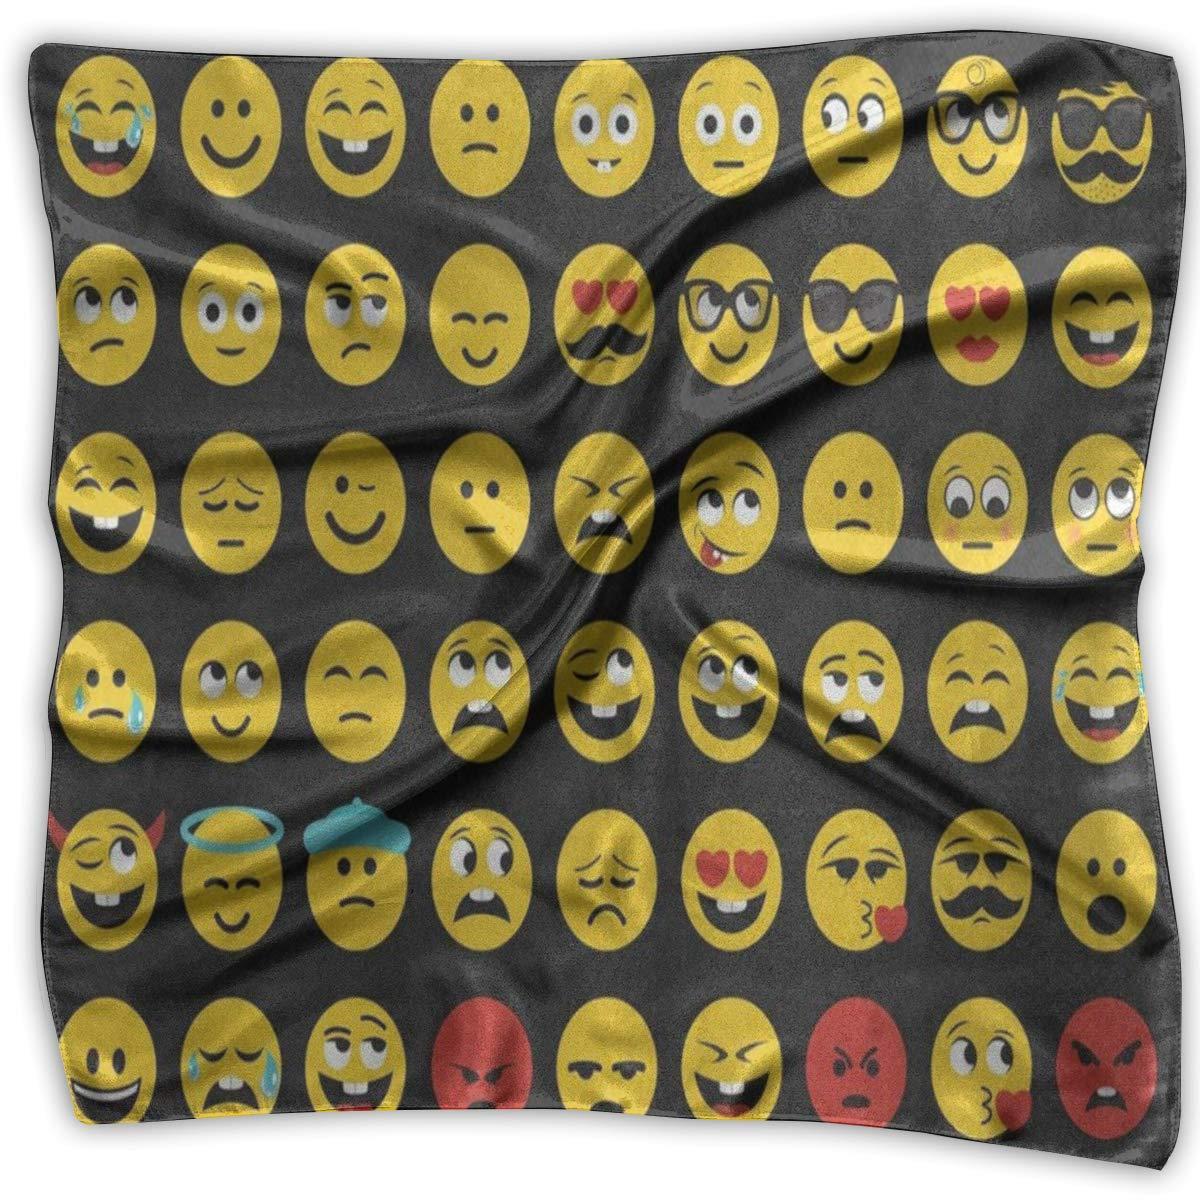 Square Scarf Smiling Face Emotion Emoji Muffler Unisex Muffler Tie For Woman